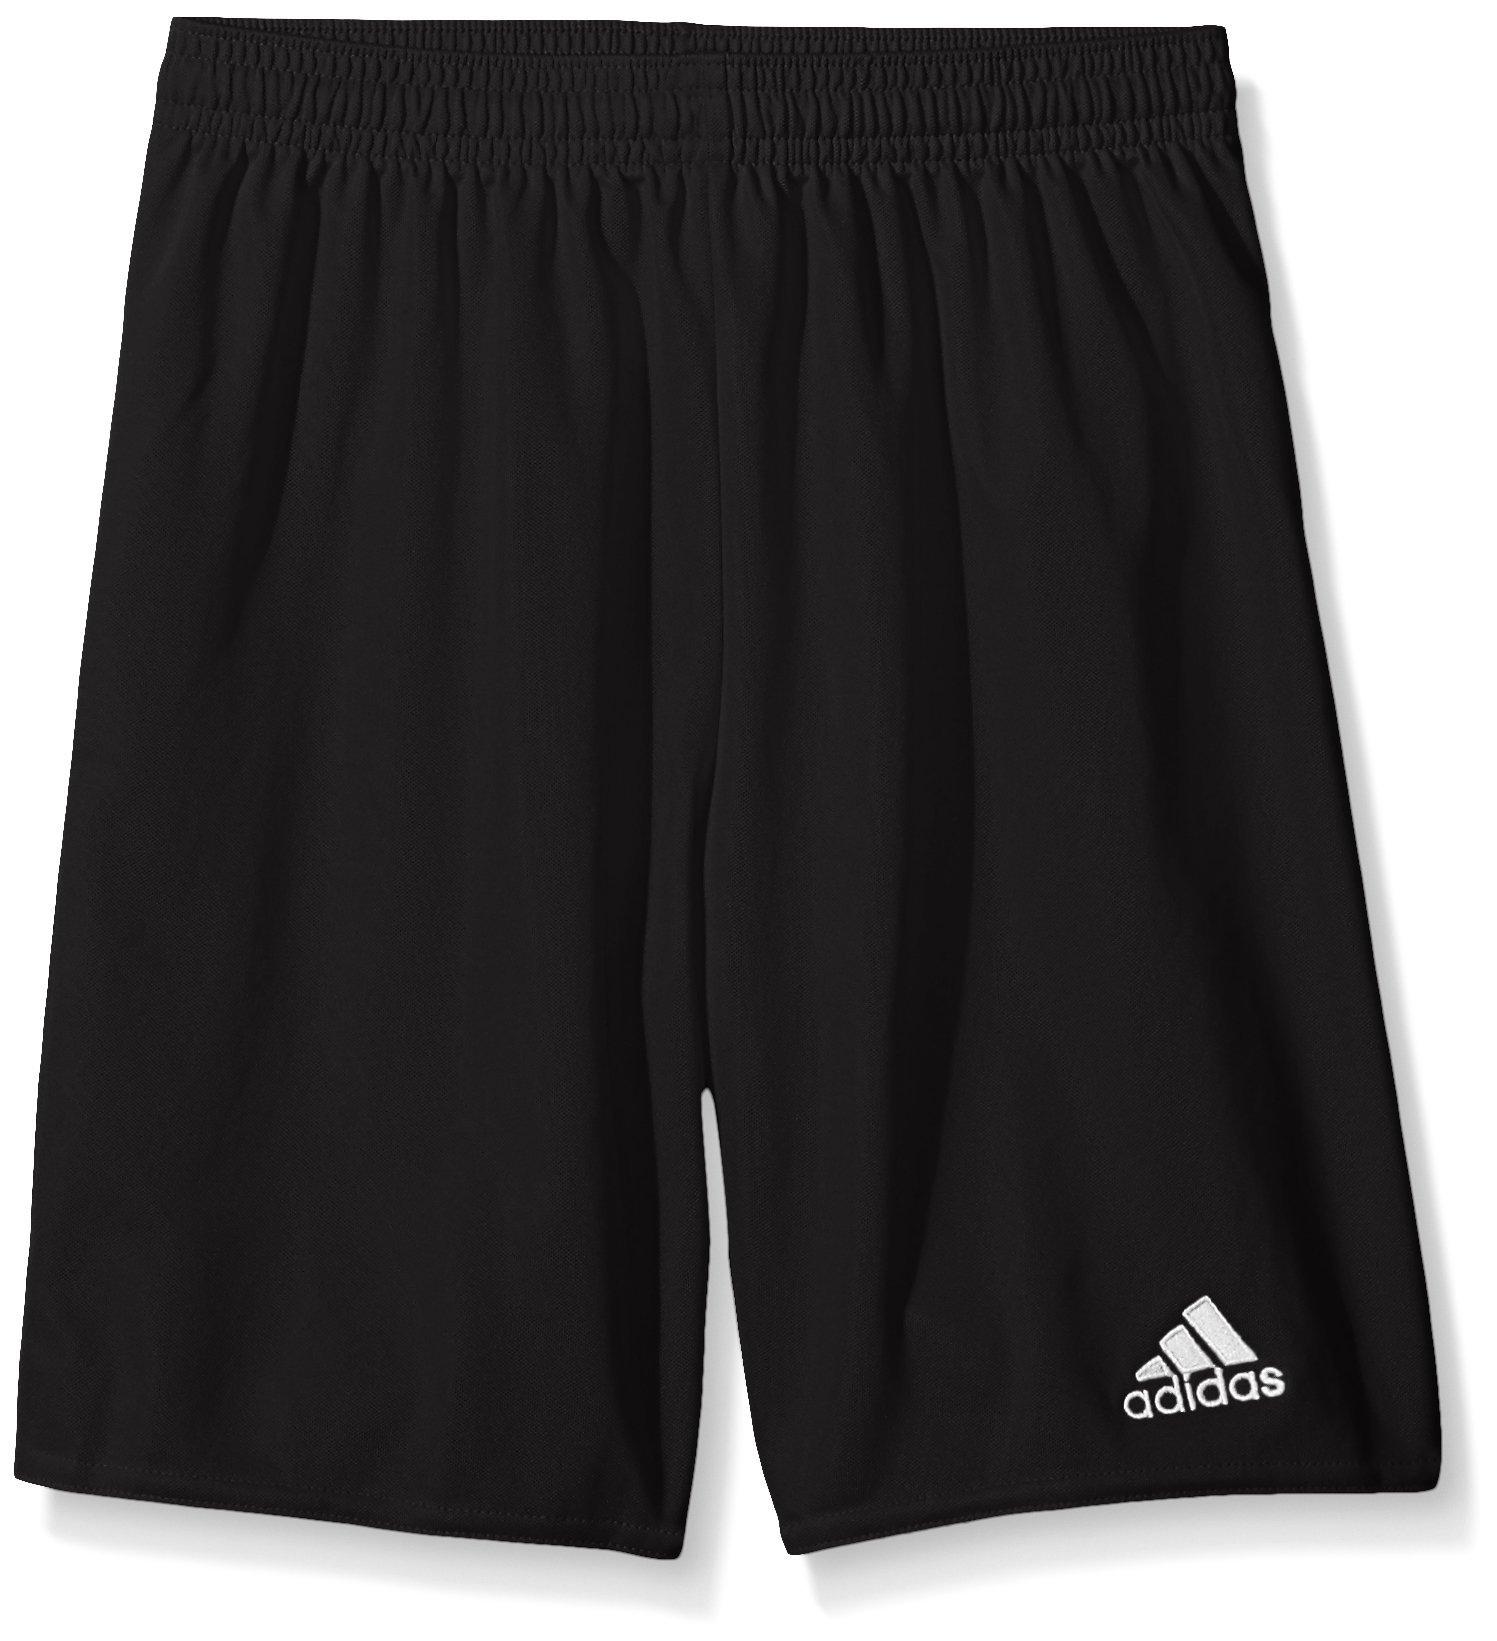 adidas Youth Parma 16 Shorts, Black/White, XX-Small by adidas